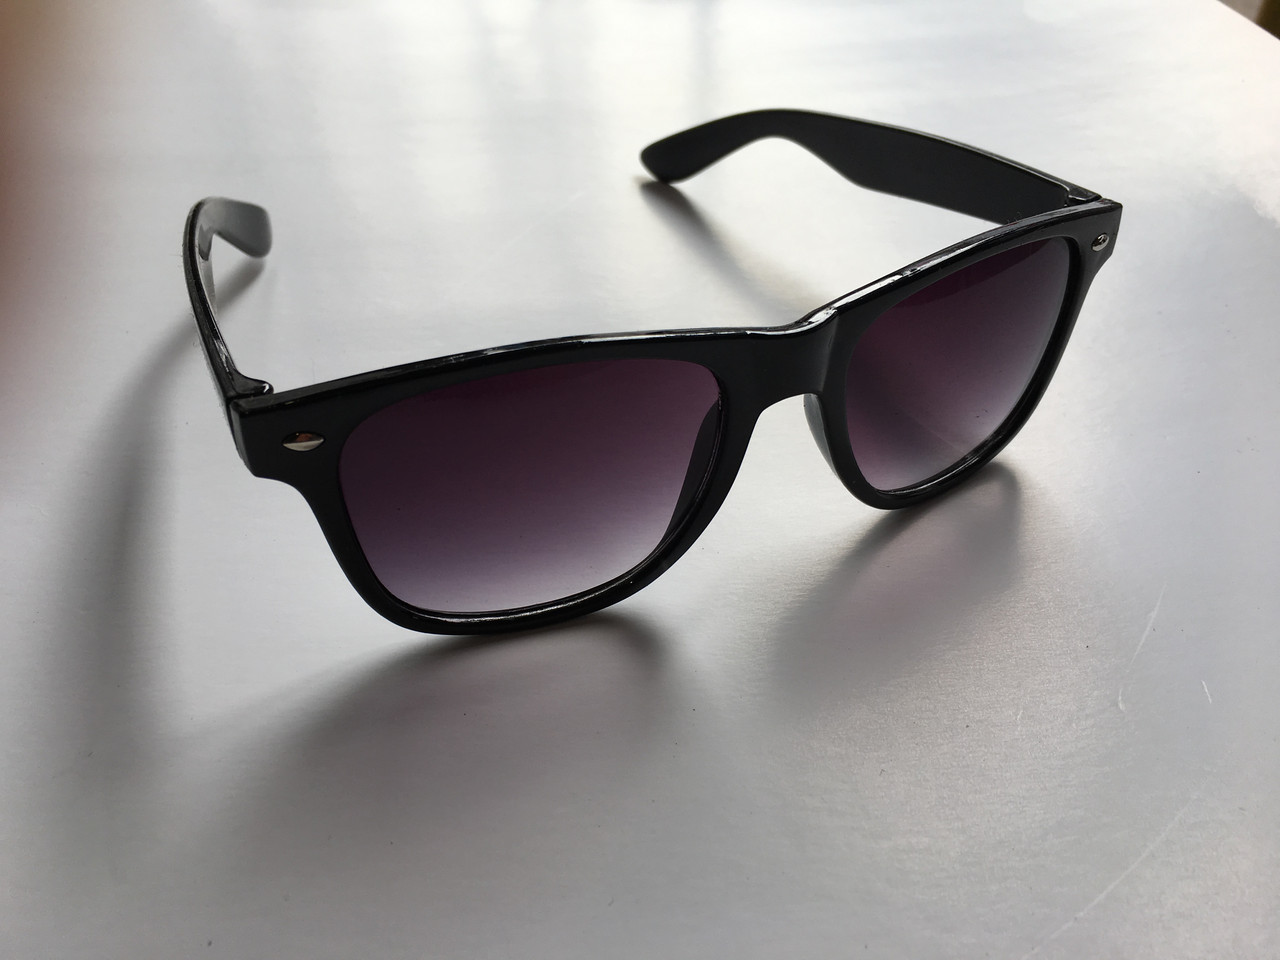 Мужские солнцезащитные очки реплика Ray Ban - Интернет-магазин Техпром в  Харькове 6f3d4025d7d